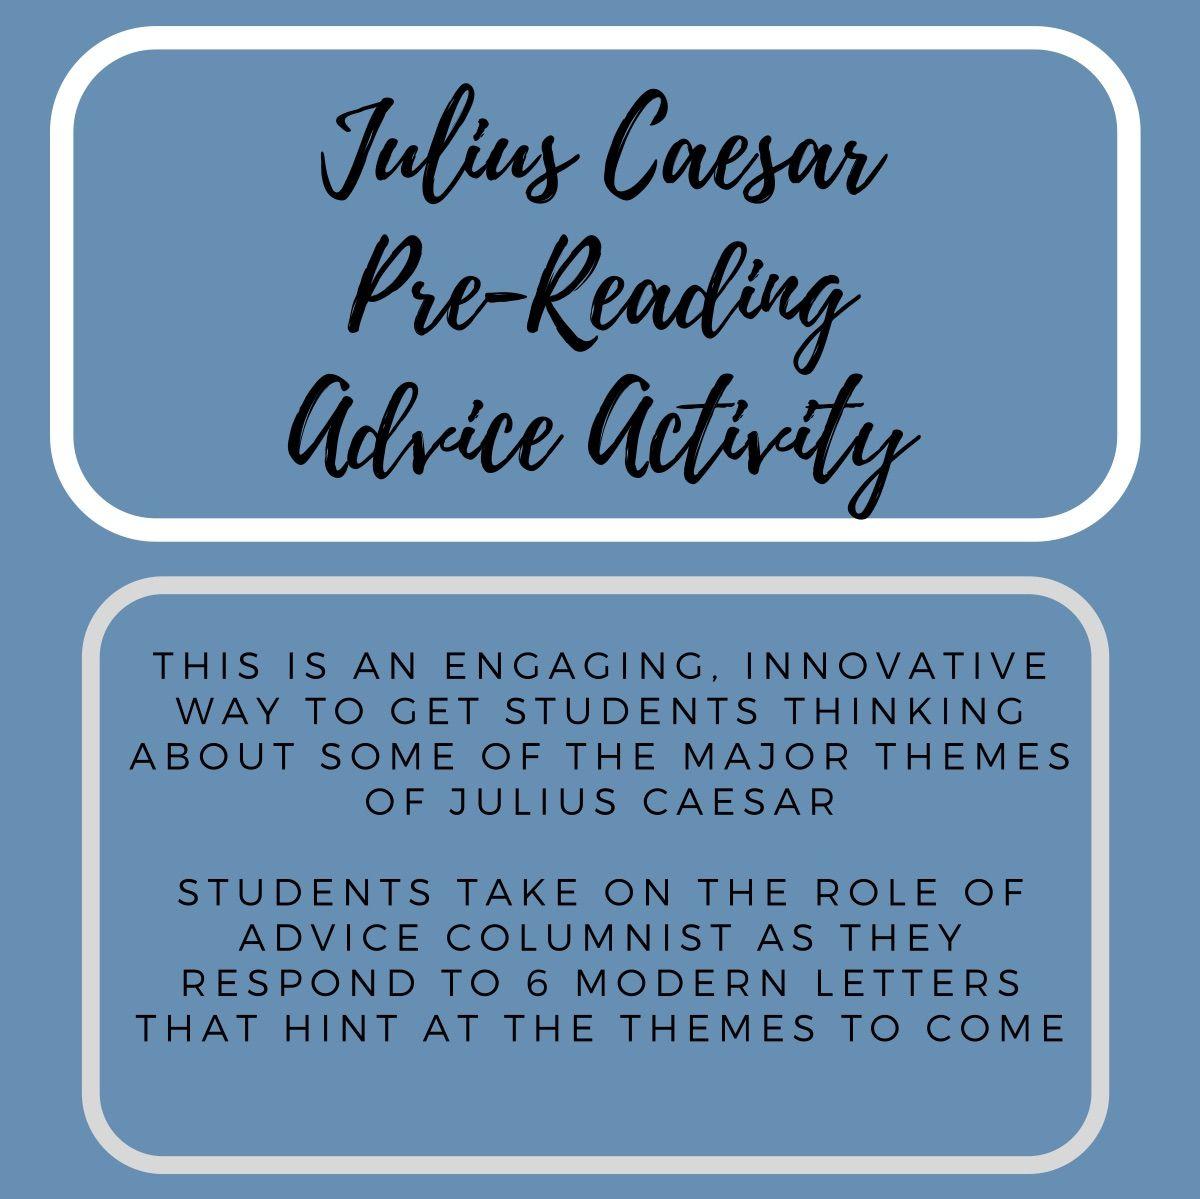 Julius Caesar Pre Reading Advice Column Station Activity